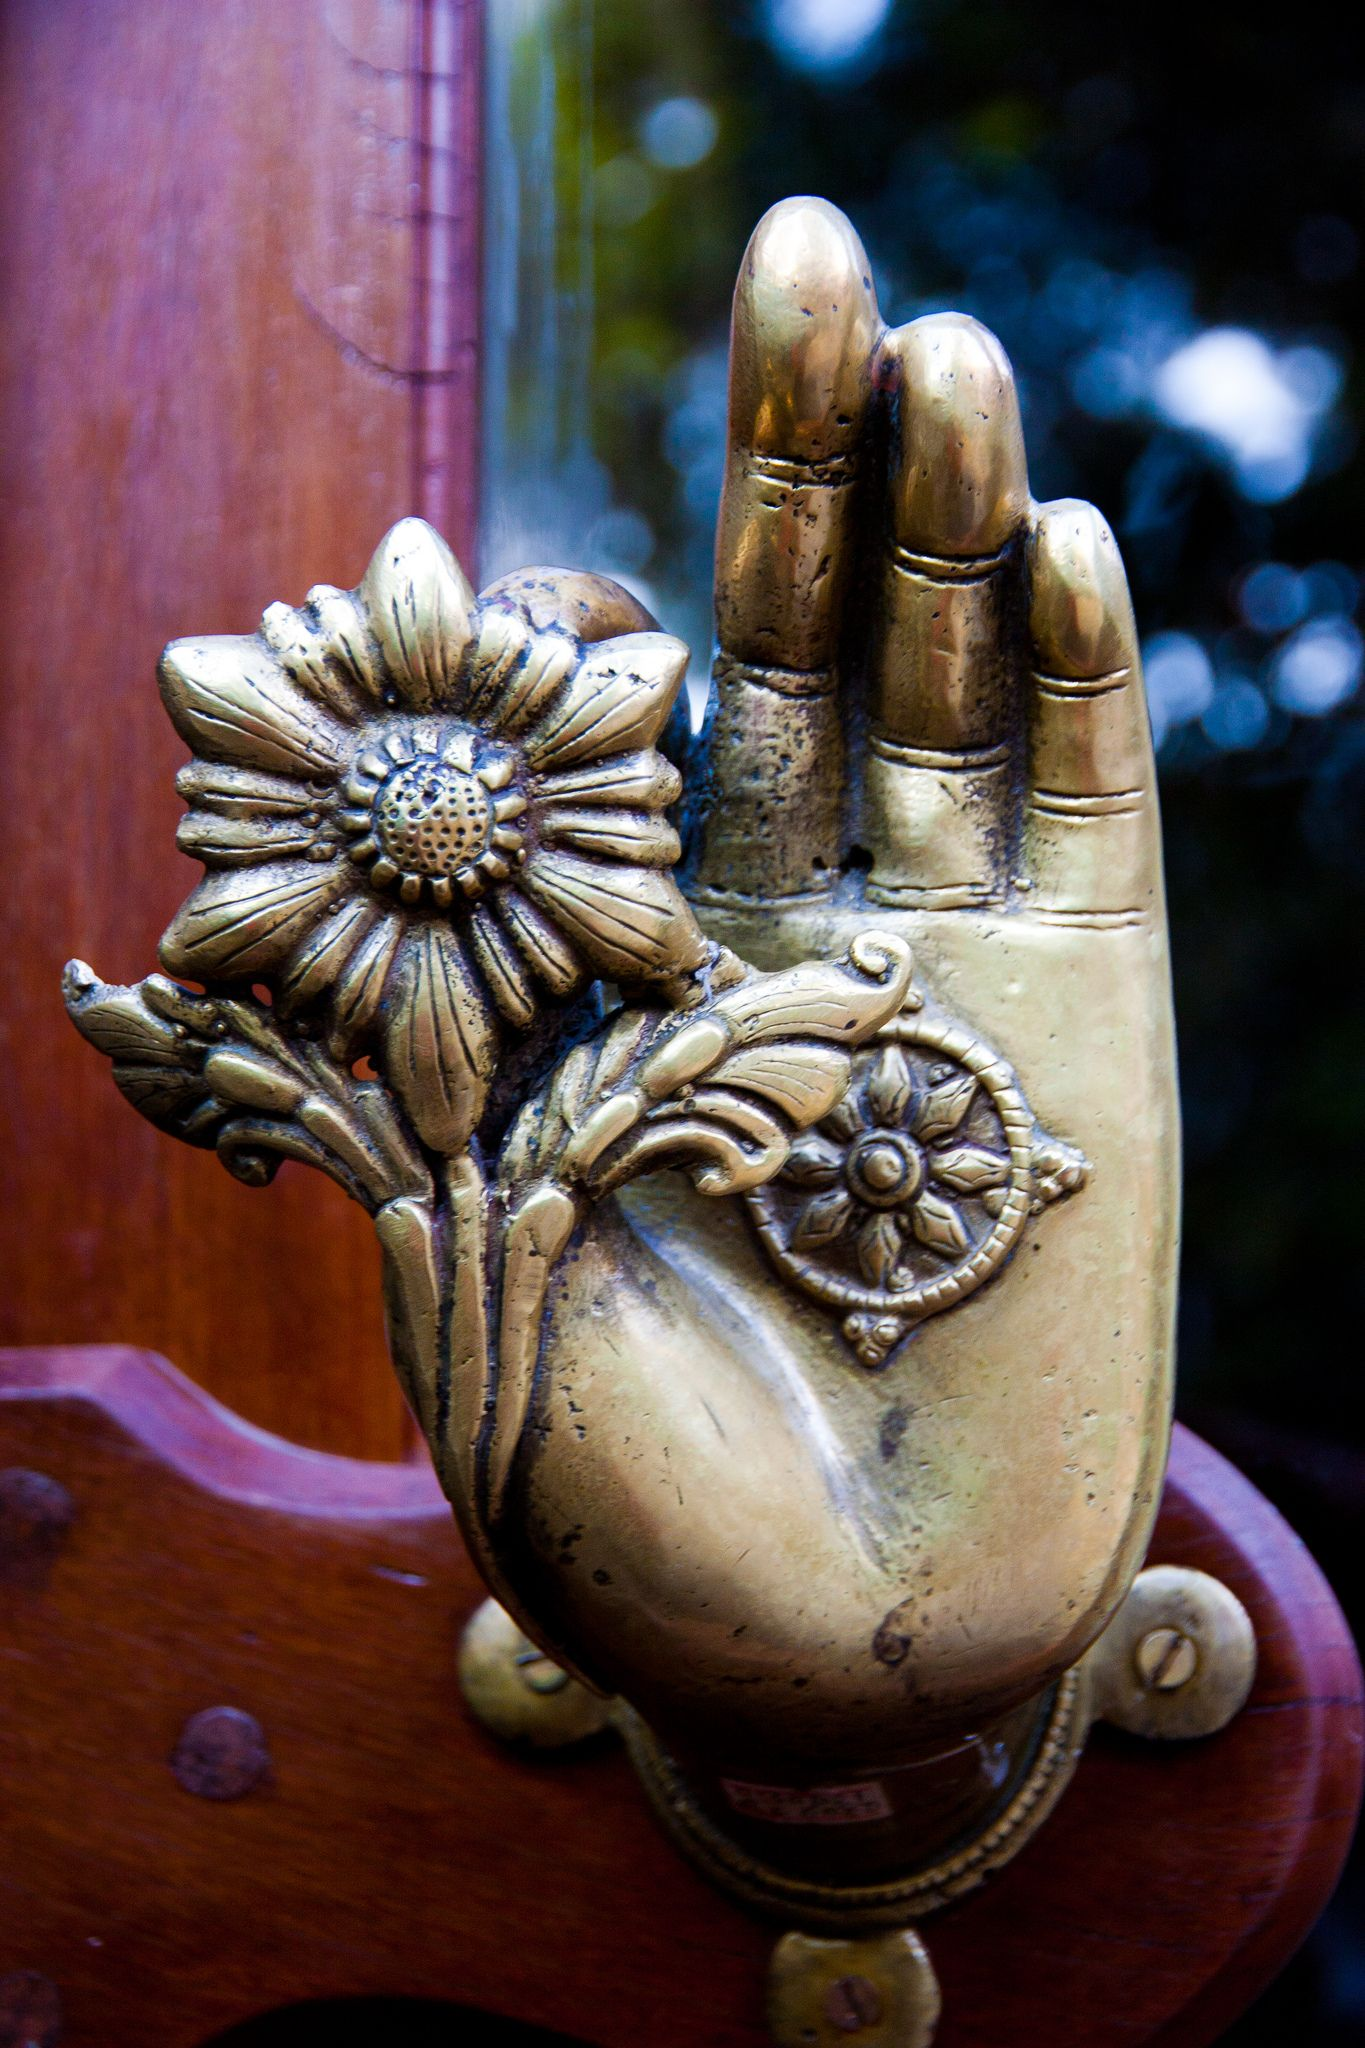 Mudra with Flower Door Knob | In the Dwarika's Hotel, Kathma… | Flickr - Photo Sharing!